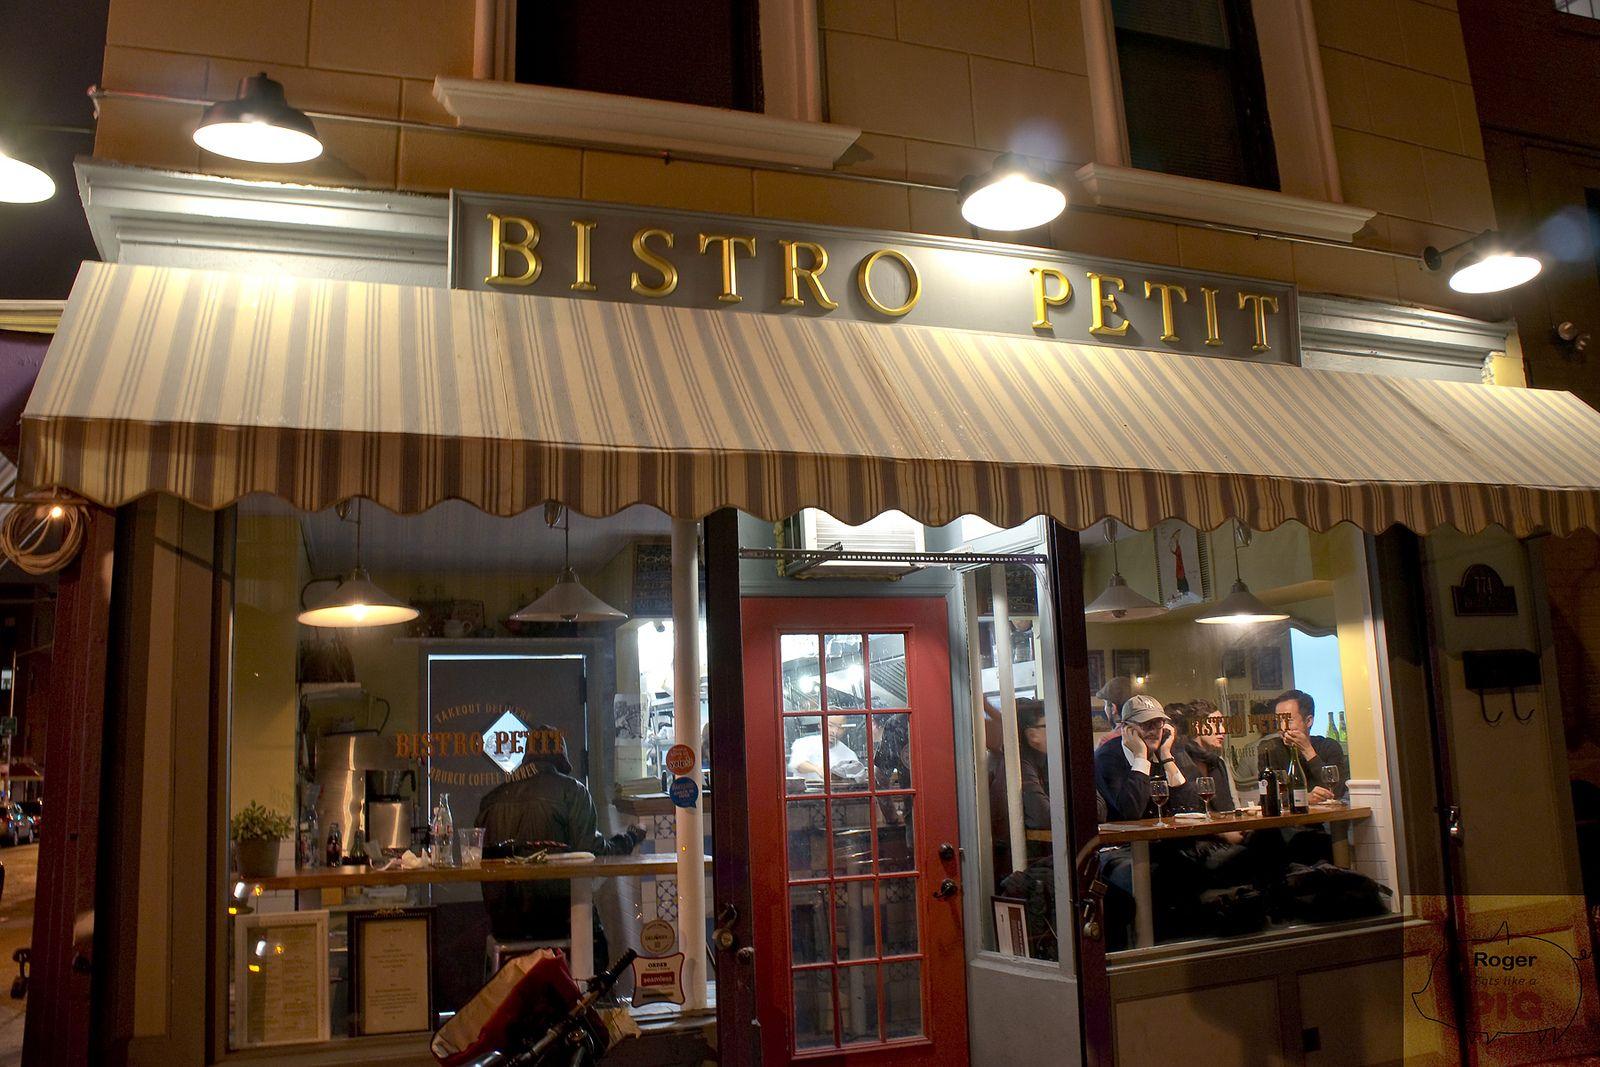 Bistro petit in brooklyn a tiny 10 seats restaurant